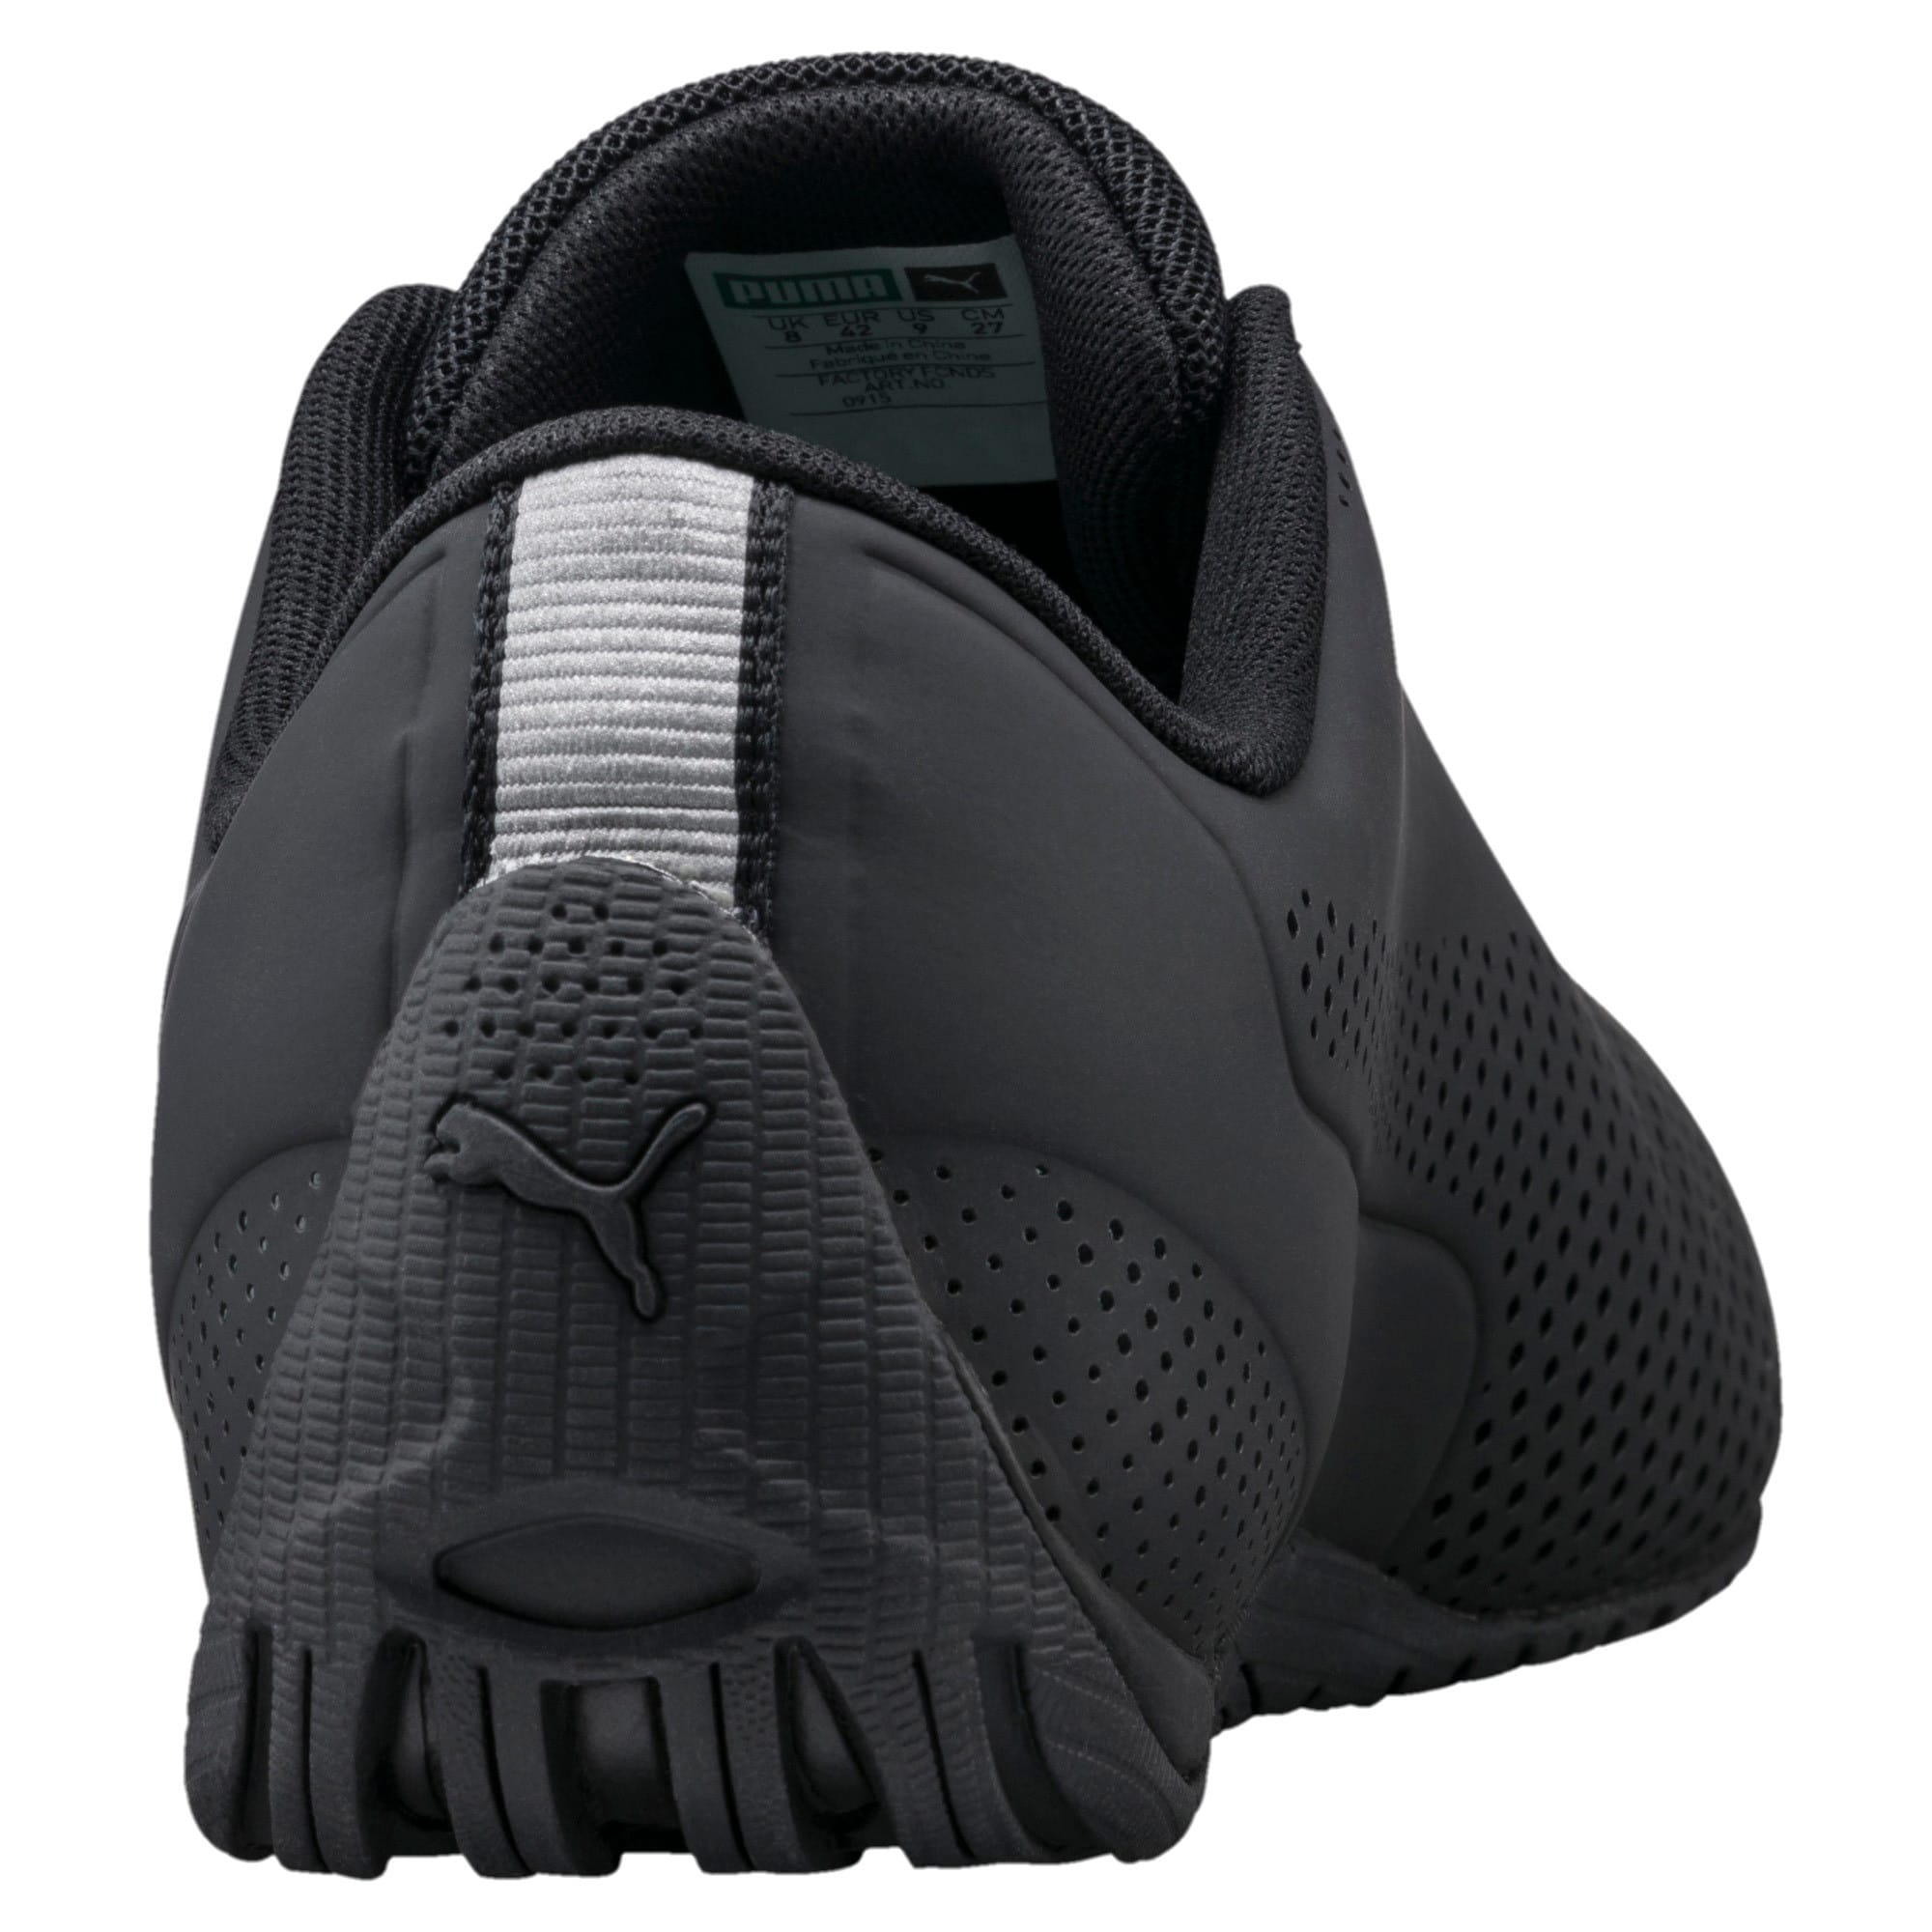 Thumbnail 4 of Drift Cat Ultra Reflective Shoes, Puma Black-Puma Black-Blk, medium